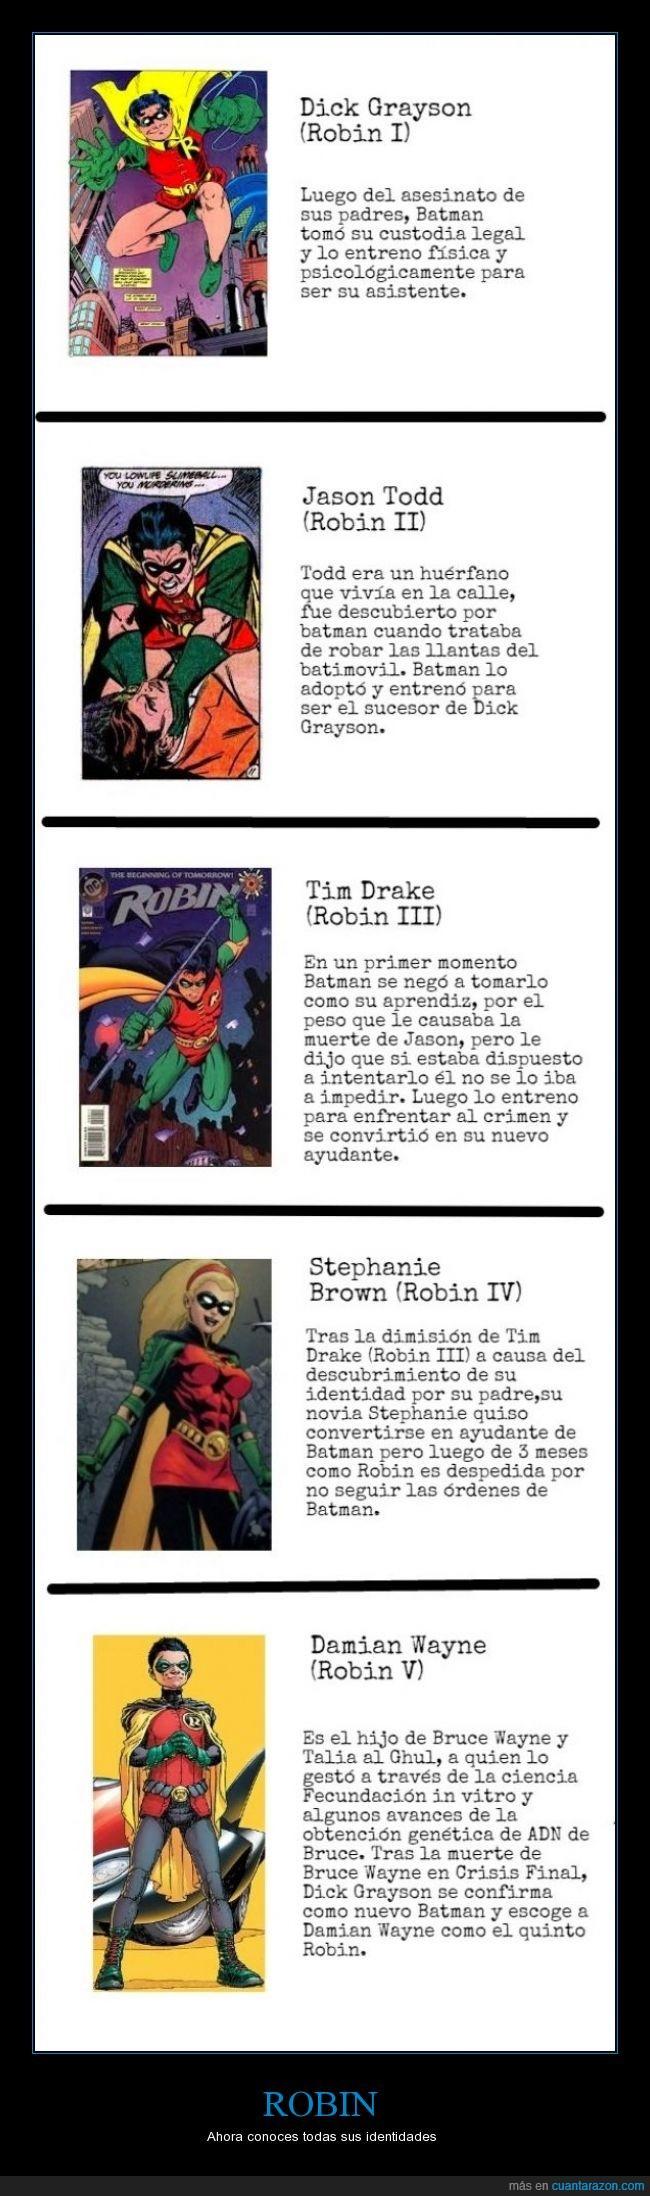 batgirl,batman,batman y robin,bruce wayne,DC,DC comics,Detective Comics,dick grayson,jason tood,mejor que superman,robin,spoiler,stephanie brown damian wayne,super heroes,tim drake